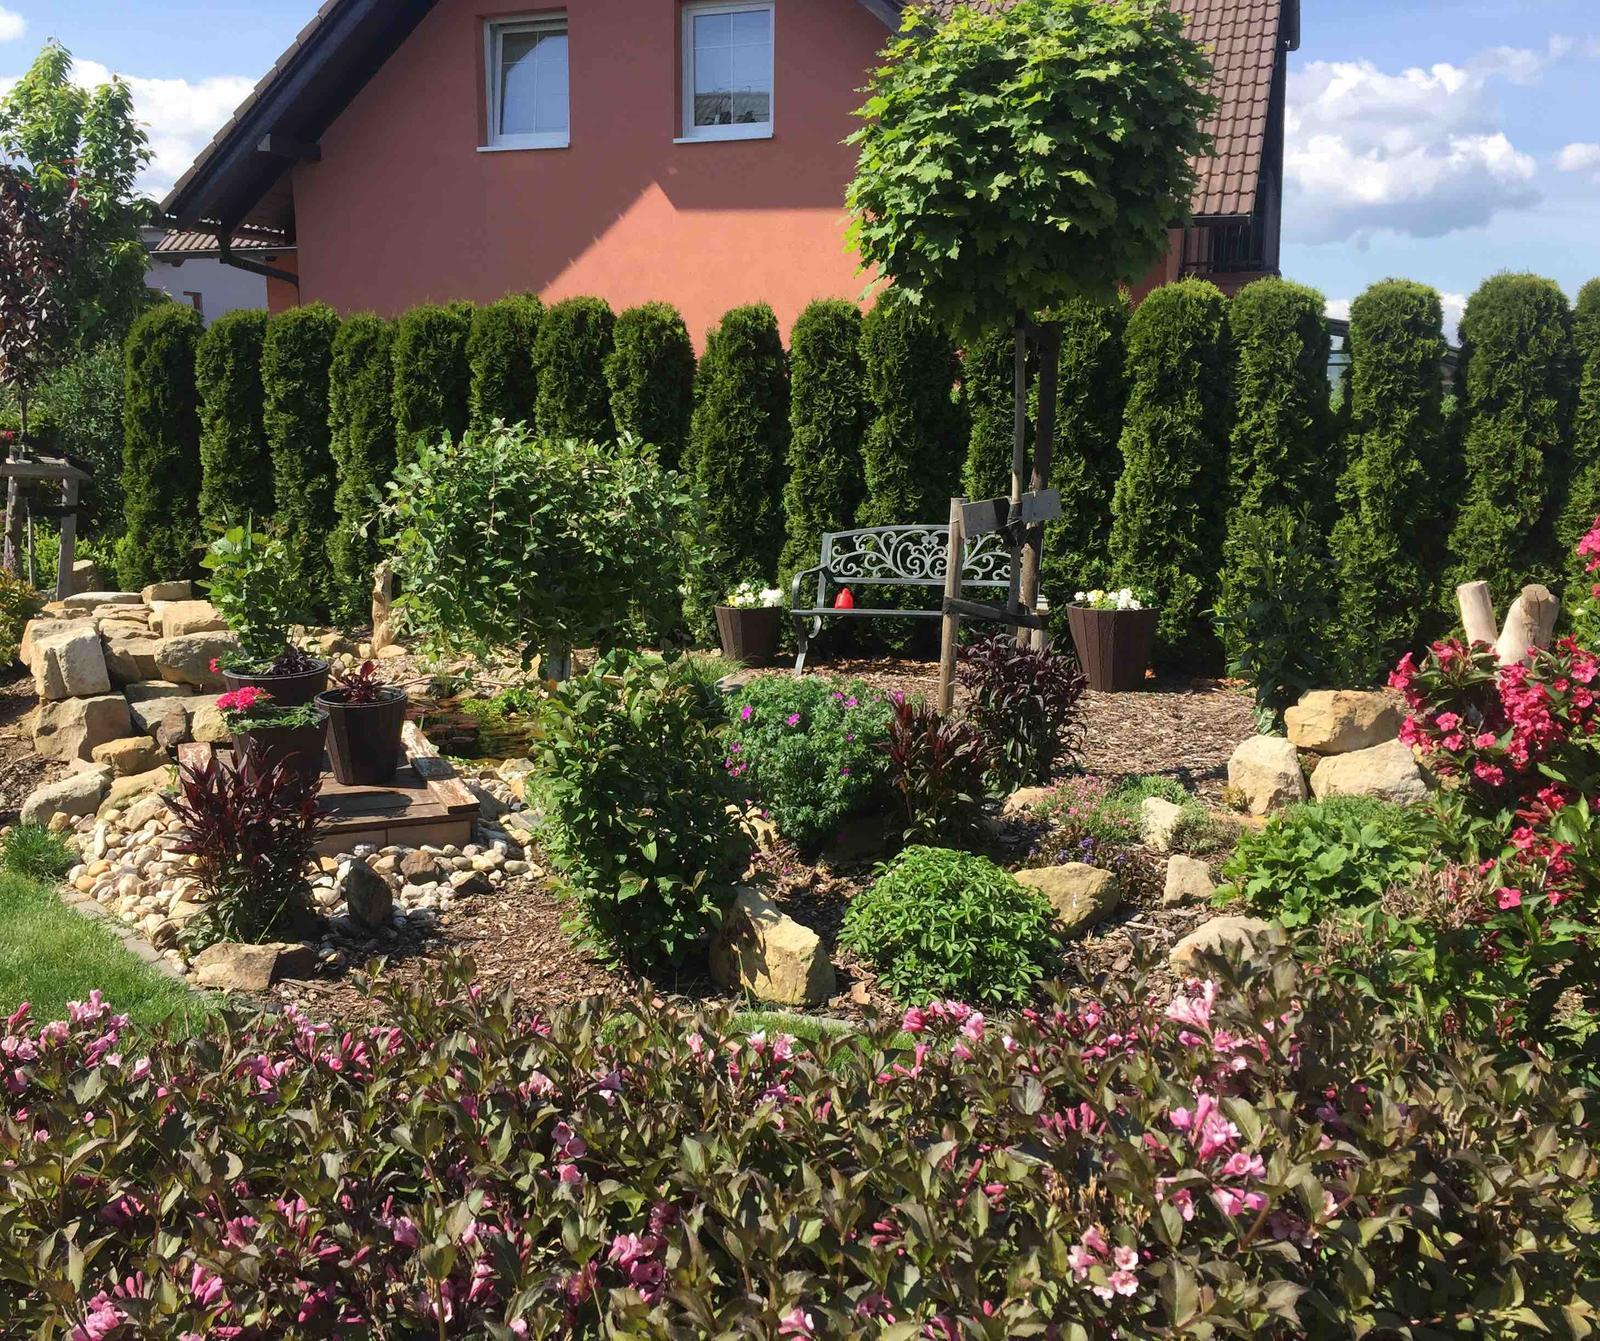 Naše barevná zahrada 🌸 rok 2020 - Pohled na lavičku